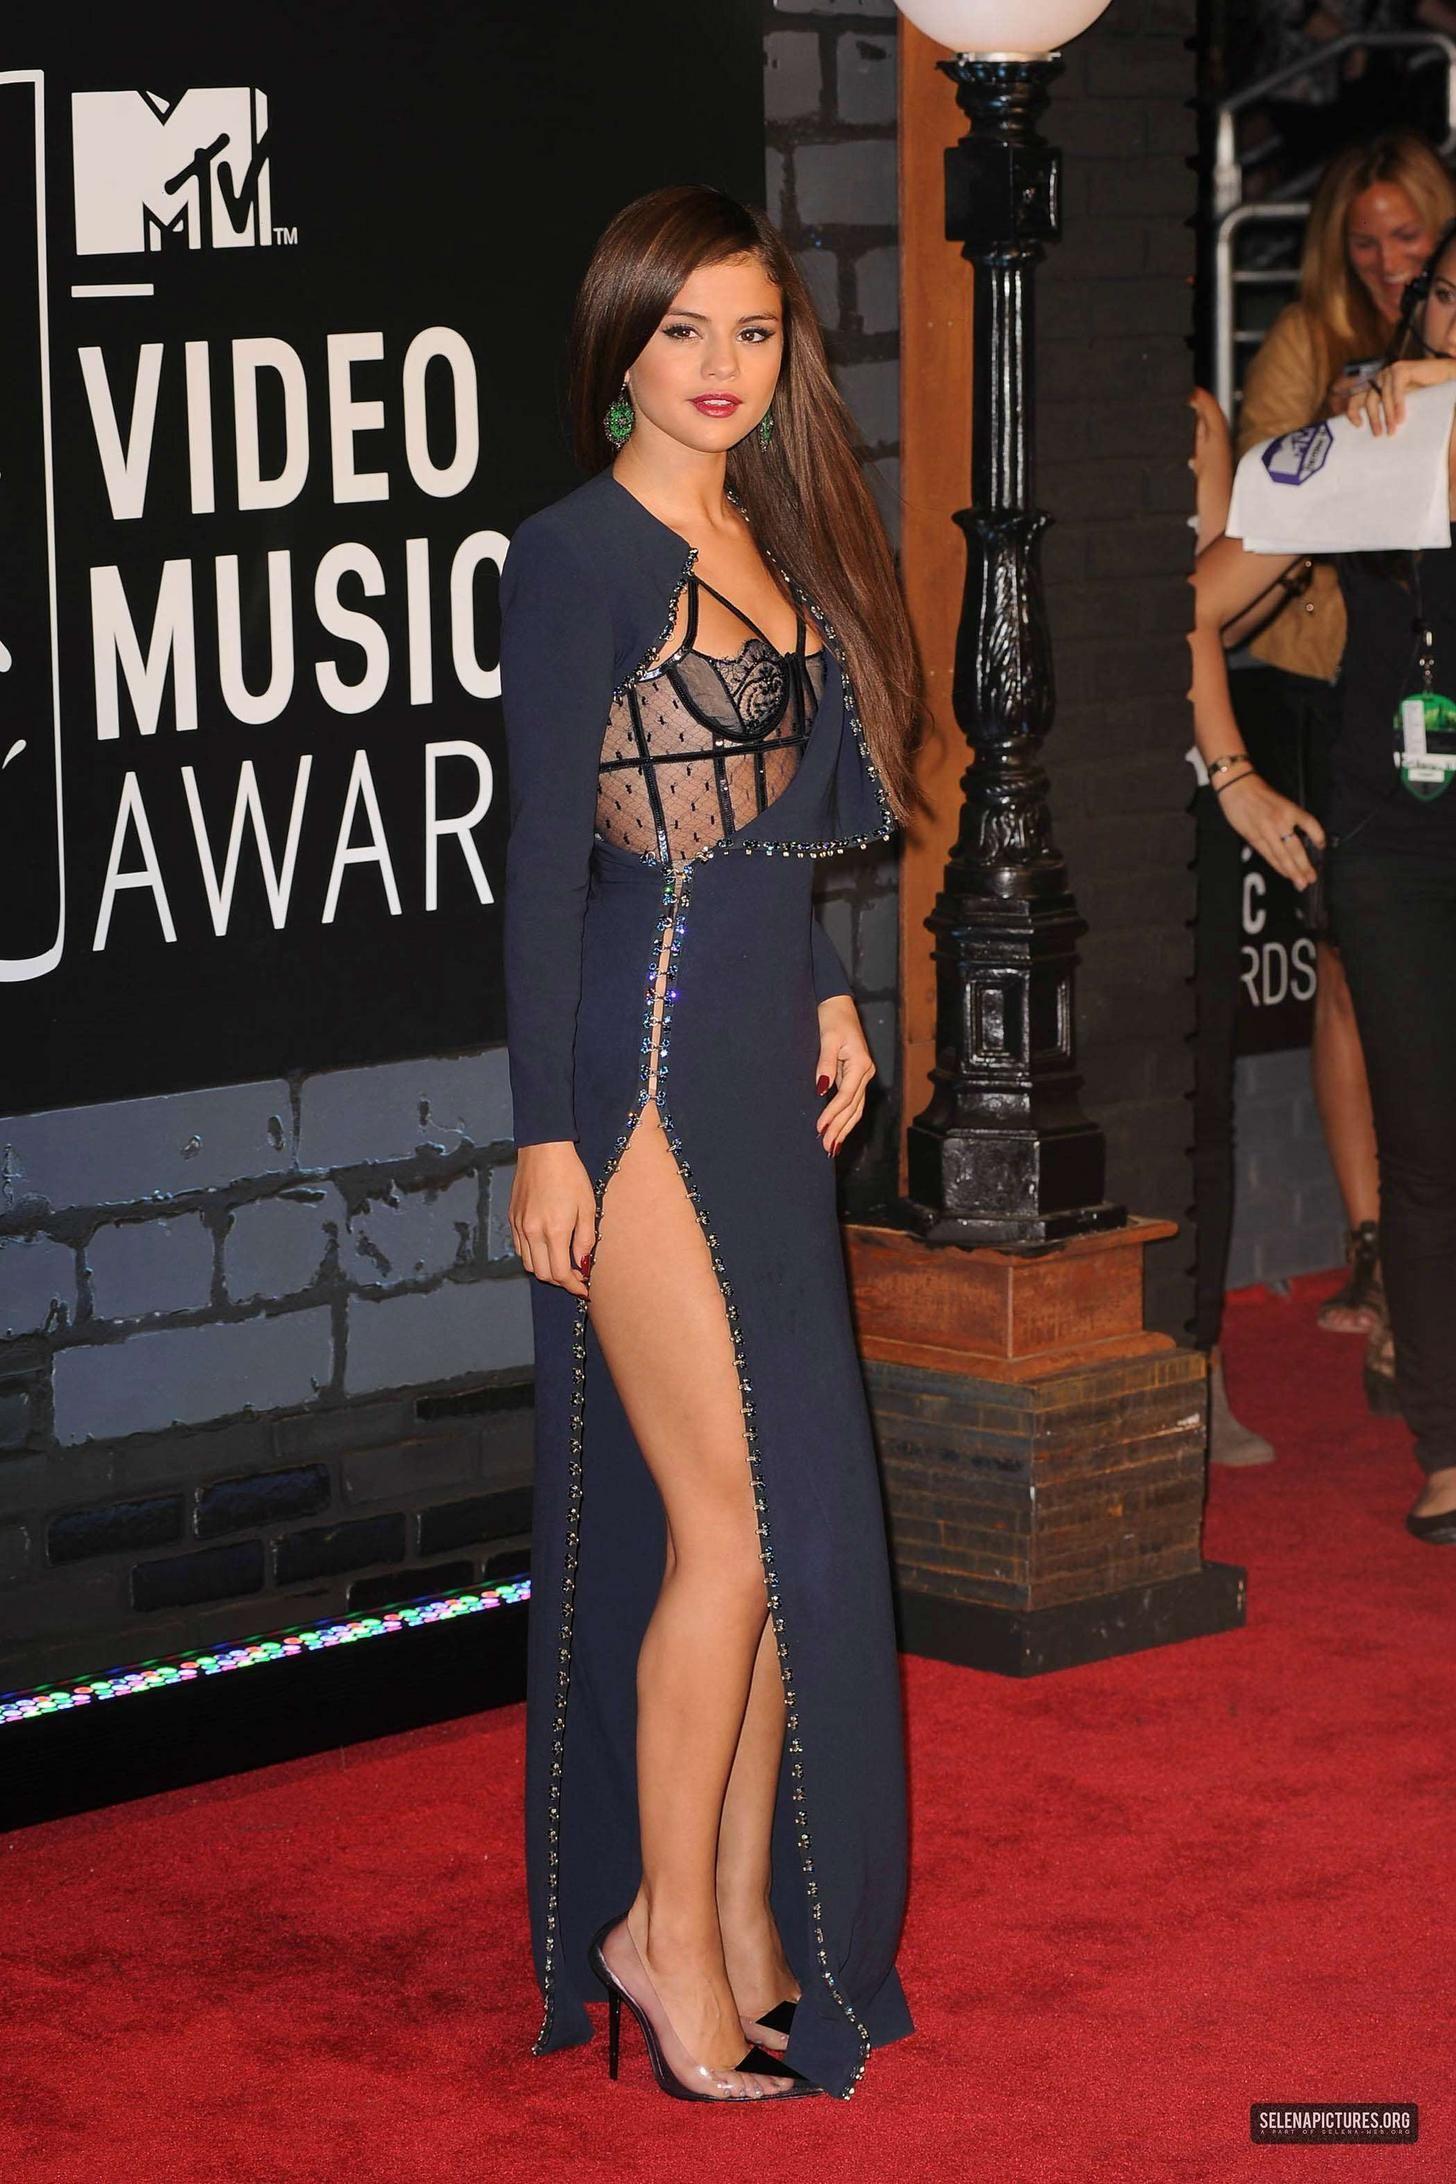 Selena Gomez Sexy Legs Imgur